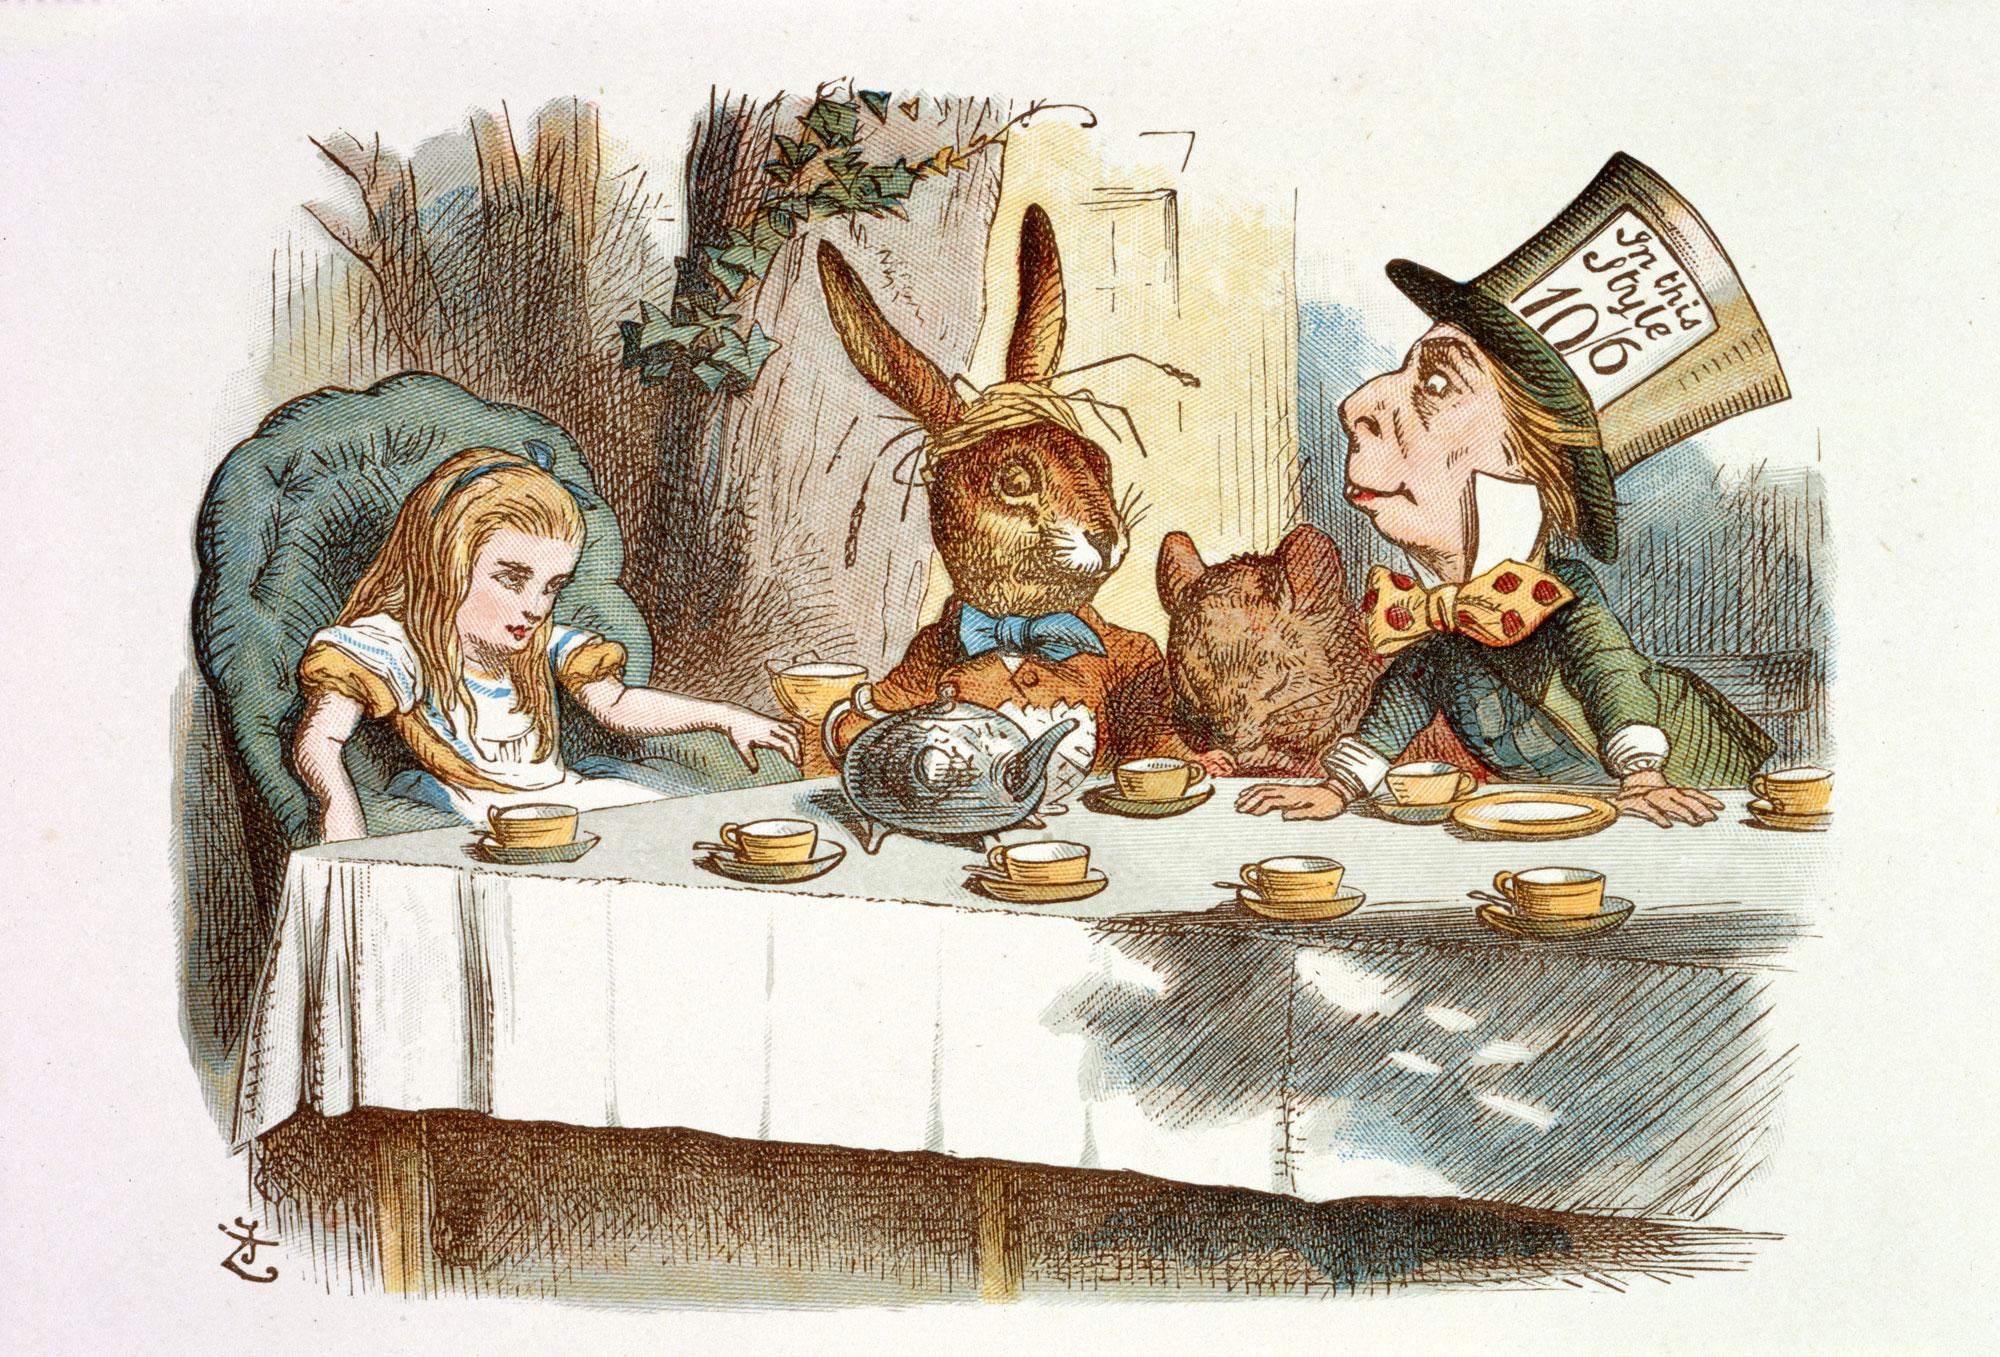 john_tenniel_-_illustration_from_the_nursery_alice_1890_-_c03757_07